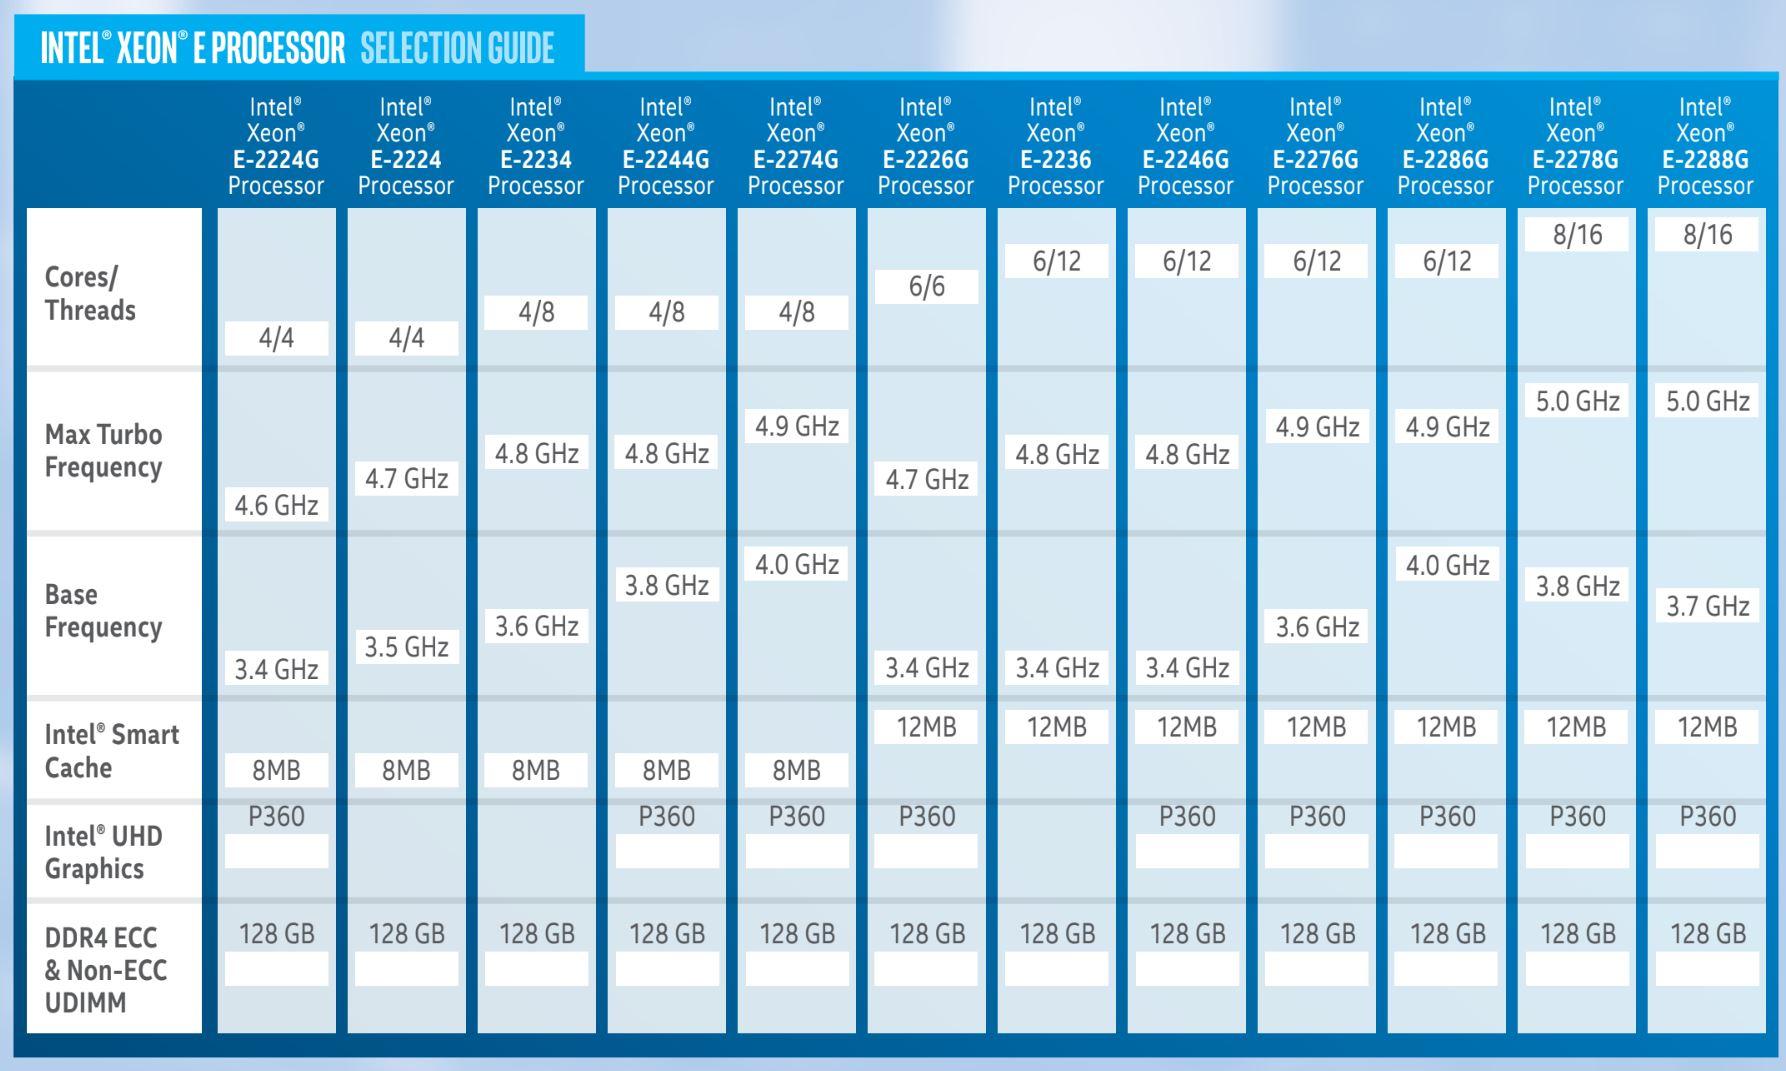 Intel Xeon E 2200 Key Spec Table 1